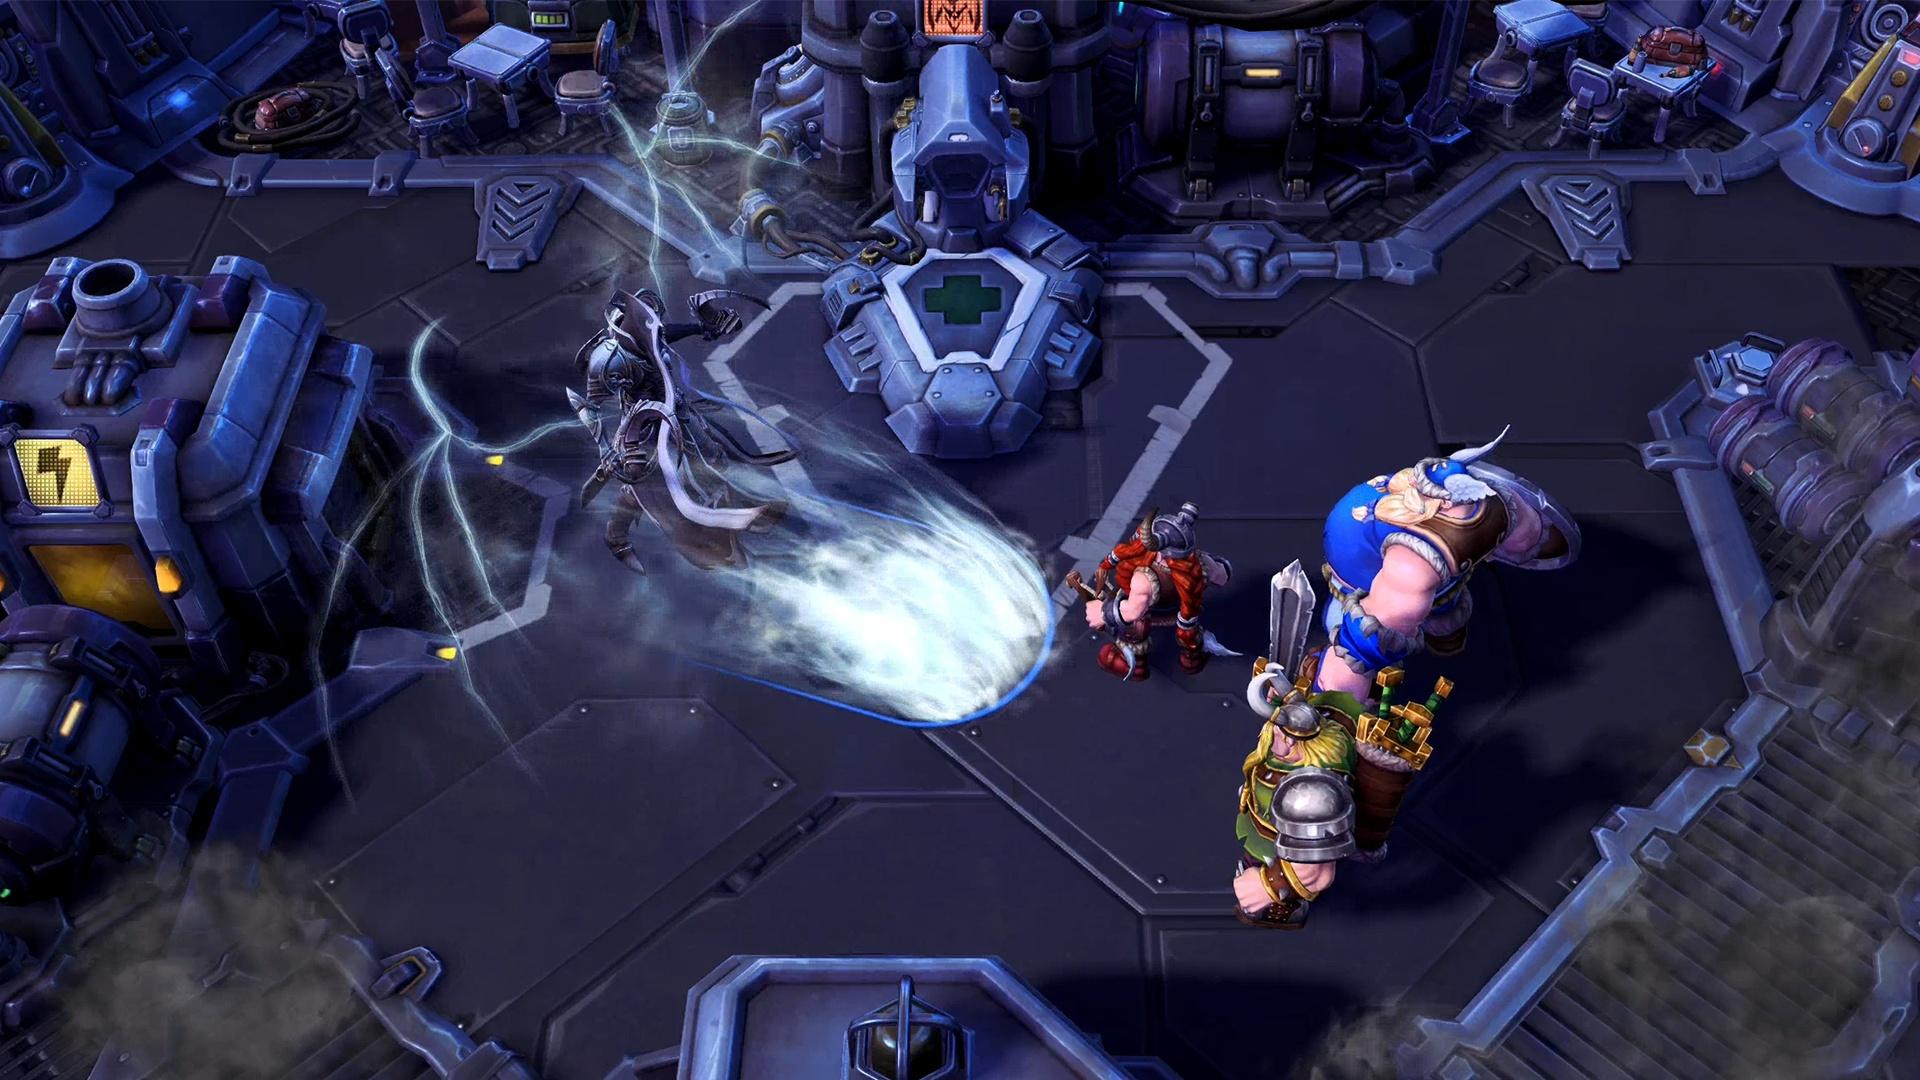 Blizzard Weekly Roundup: Malthael Hero, New Overwatch Map